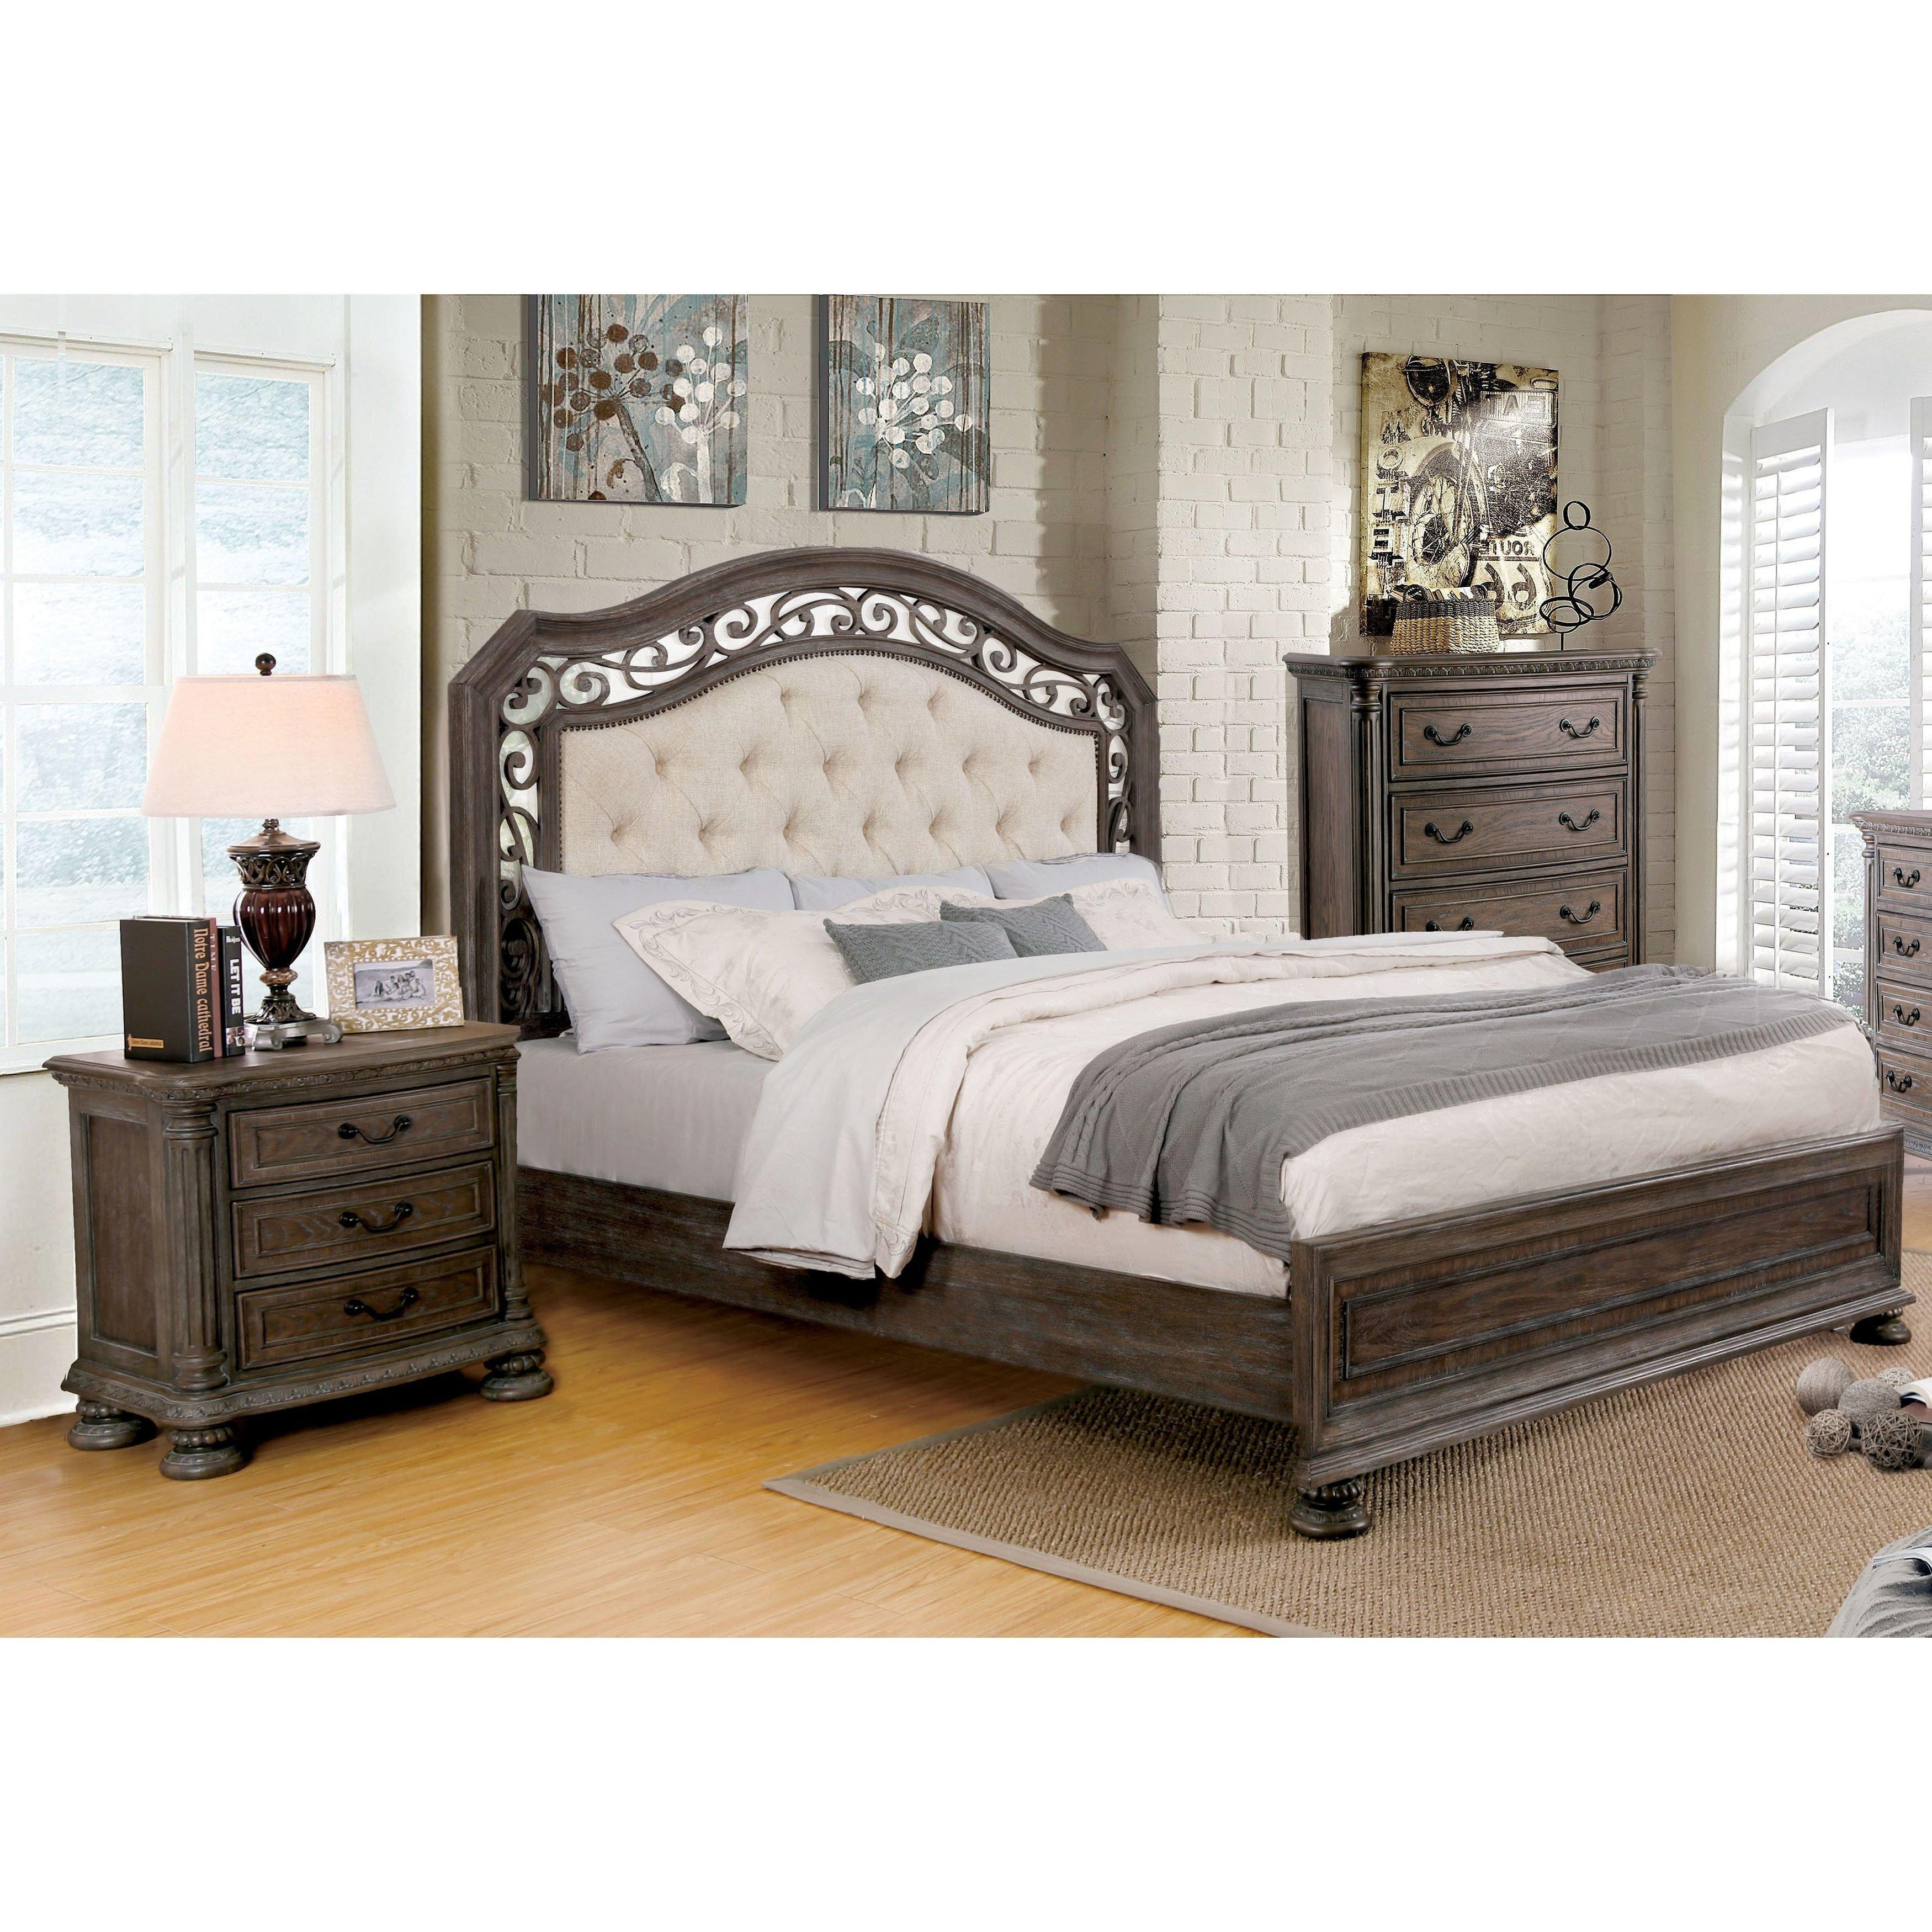 3 Piece Bedroom Furniture Set New Furniture Of America Brez Traditional Brown 3 Piece Bedroom